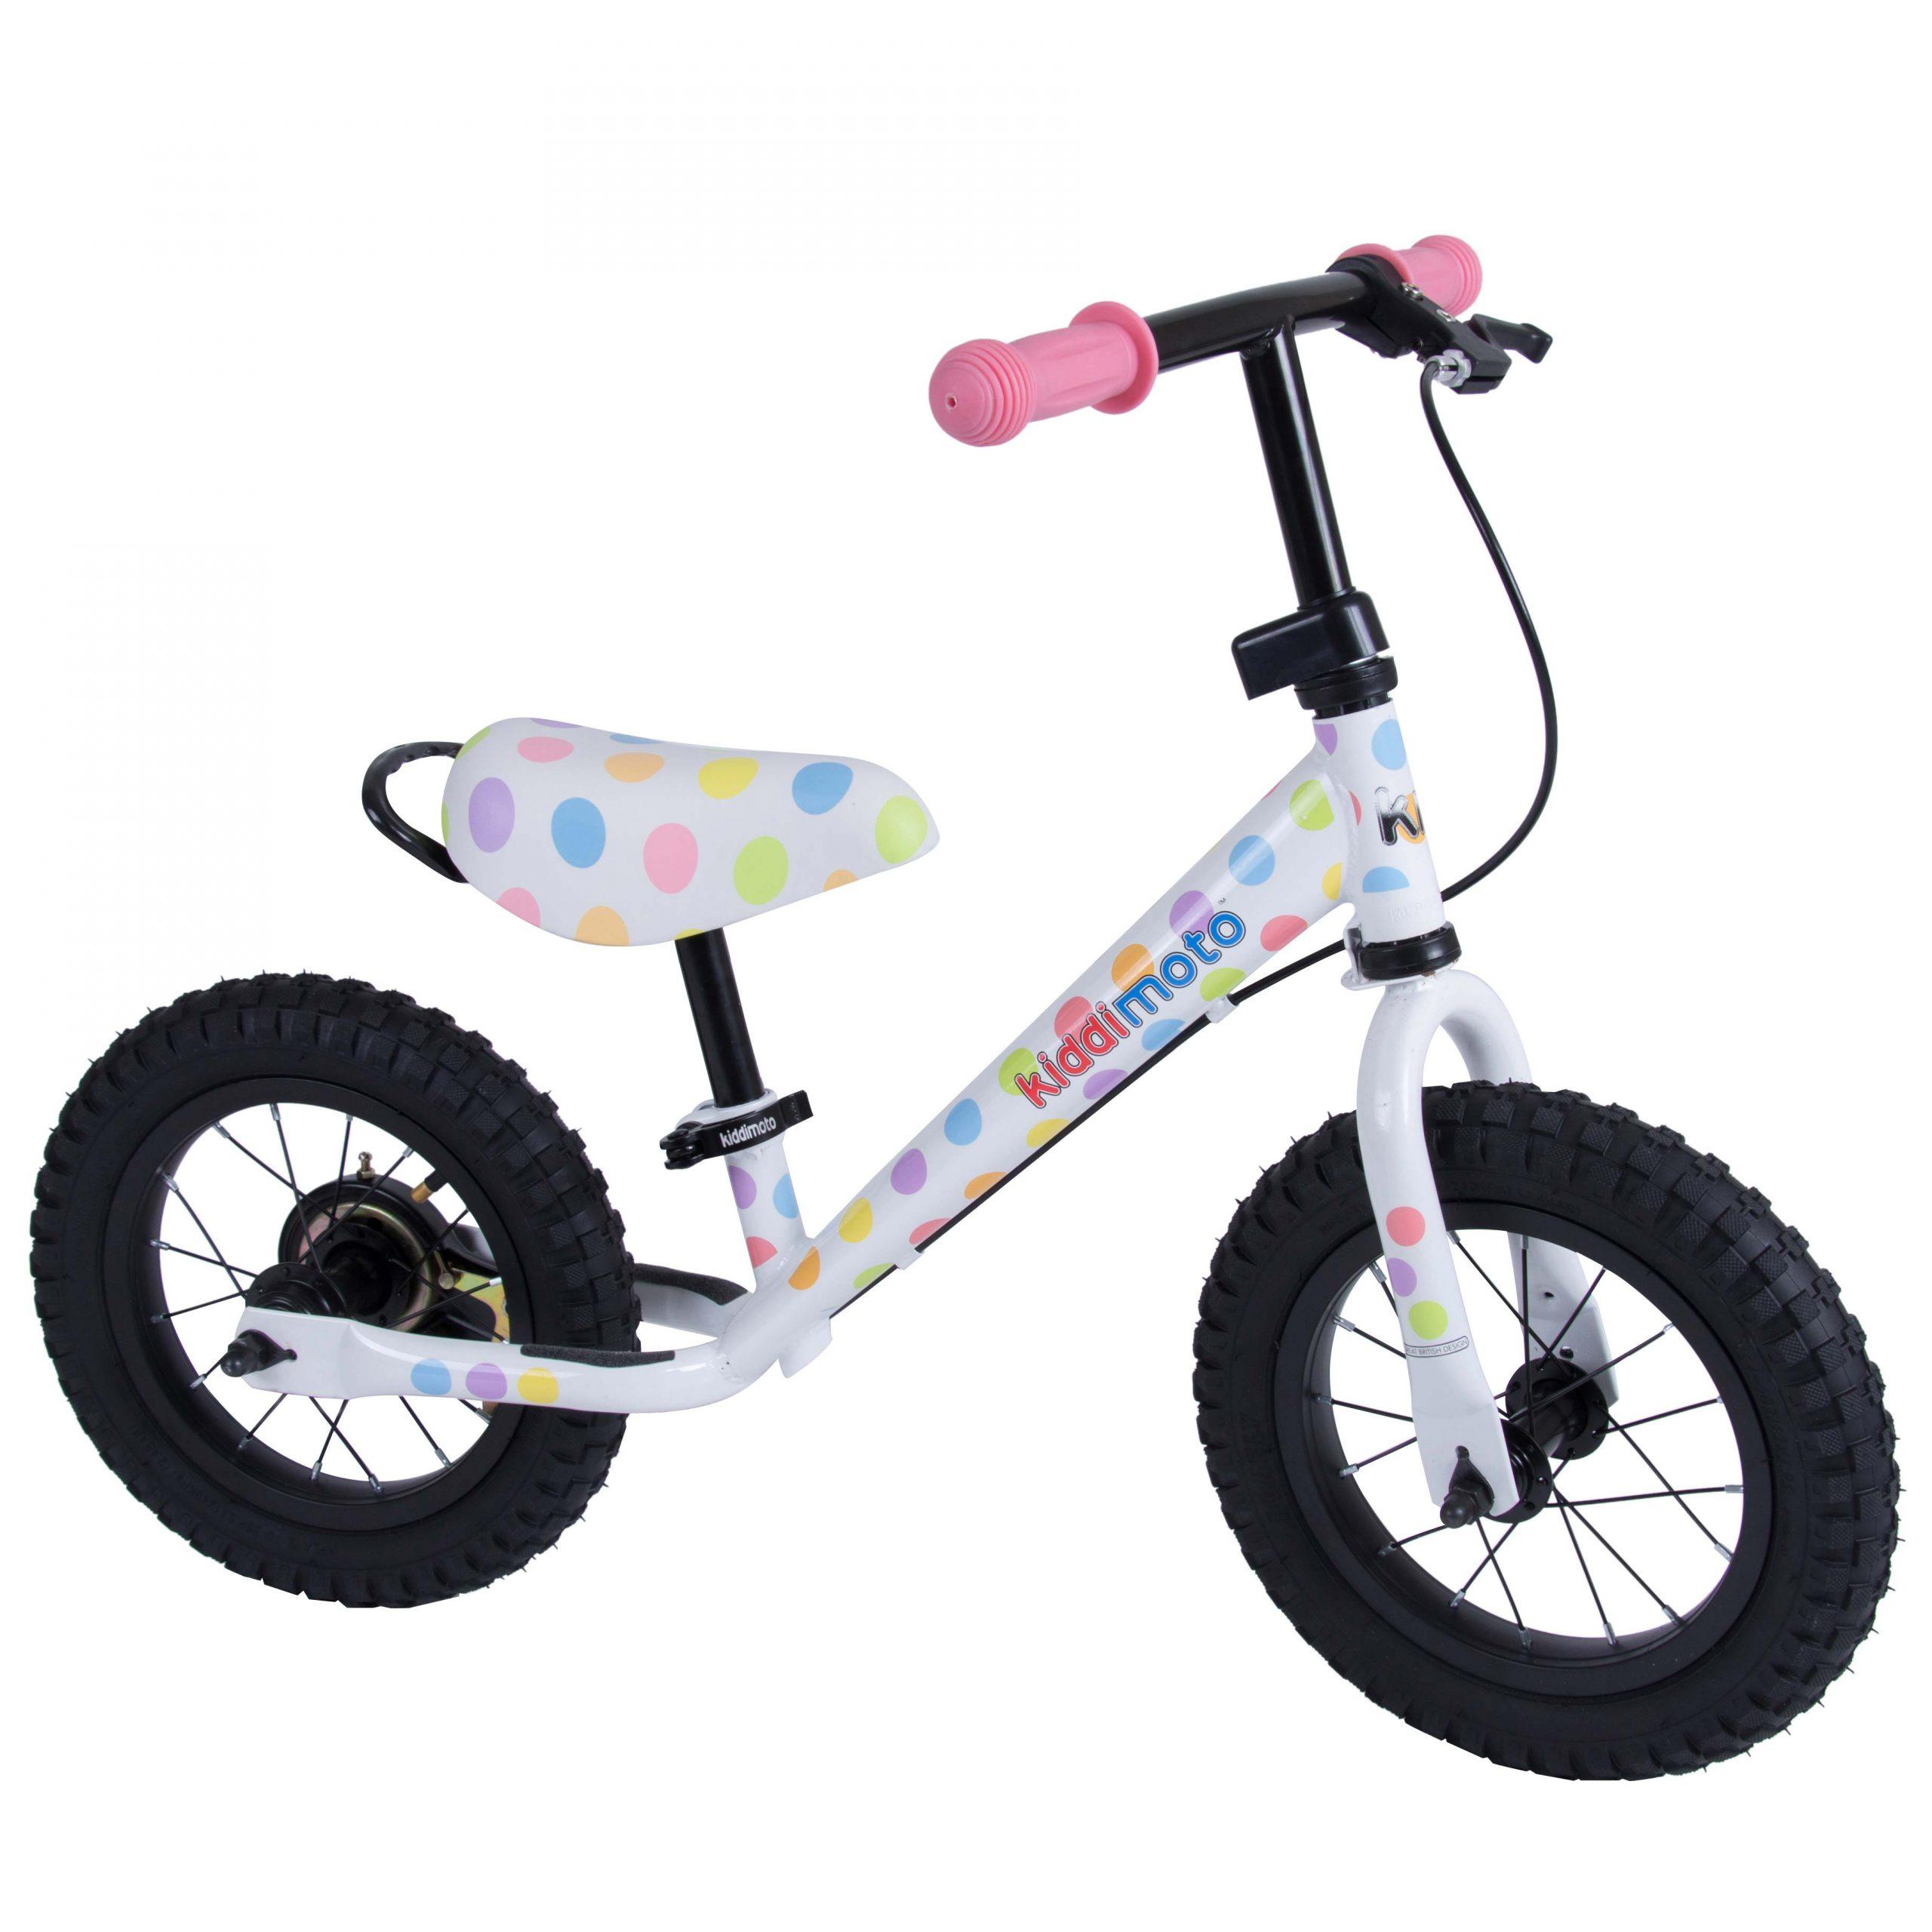 Kiddimoto Bike Helmet Pastel Dotty